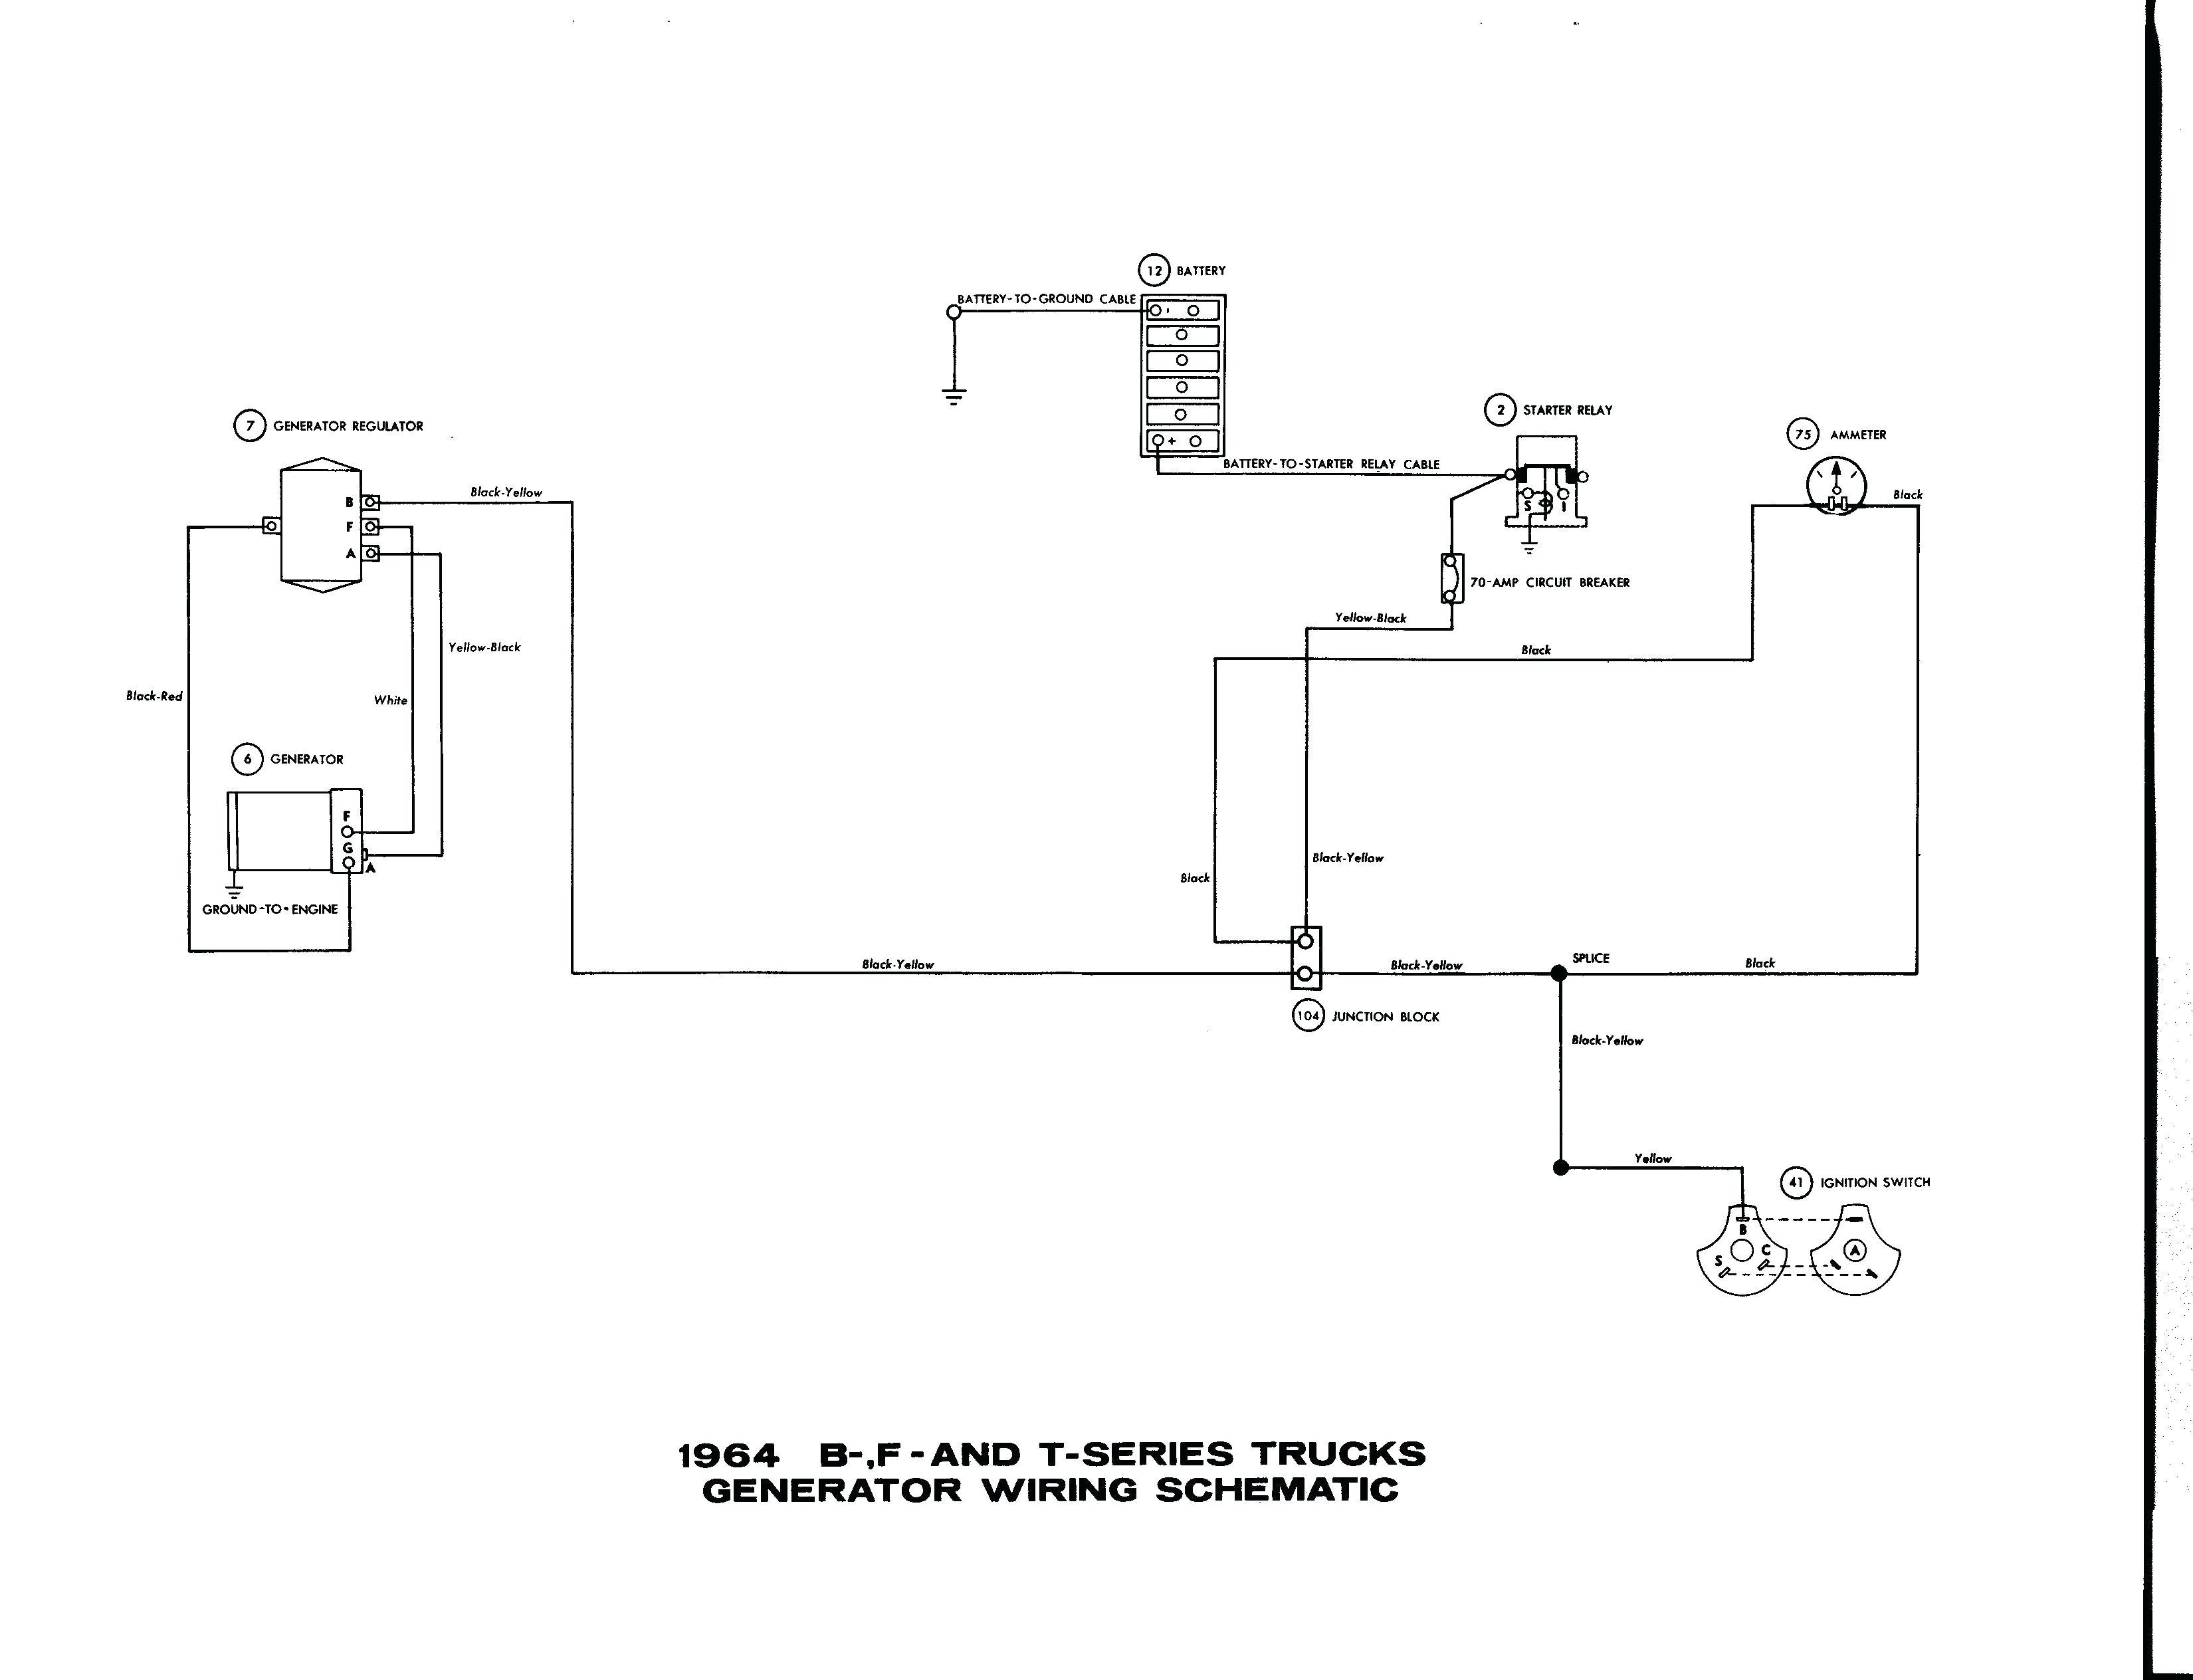 Gm Backup Camera Wiring | Best Wiring Library - Gm Backup Camera Wiring Diagram